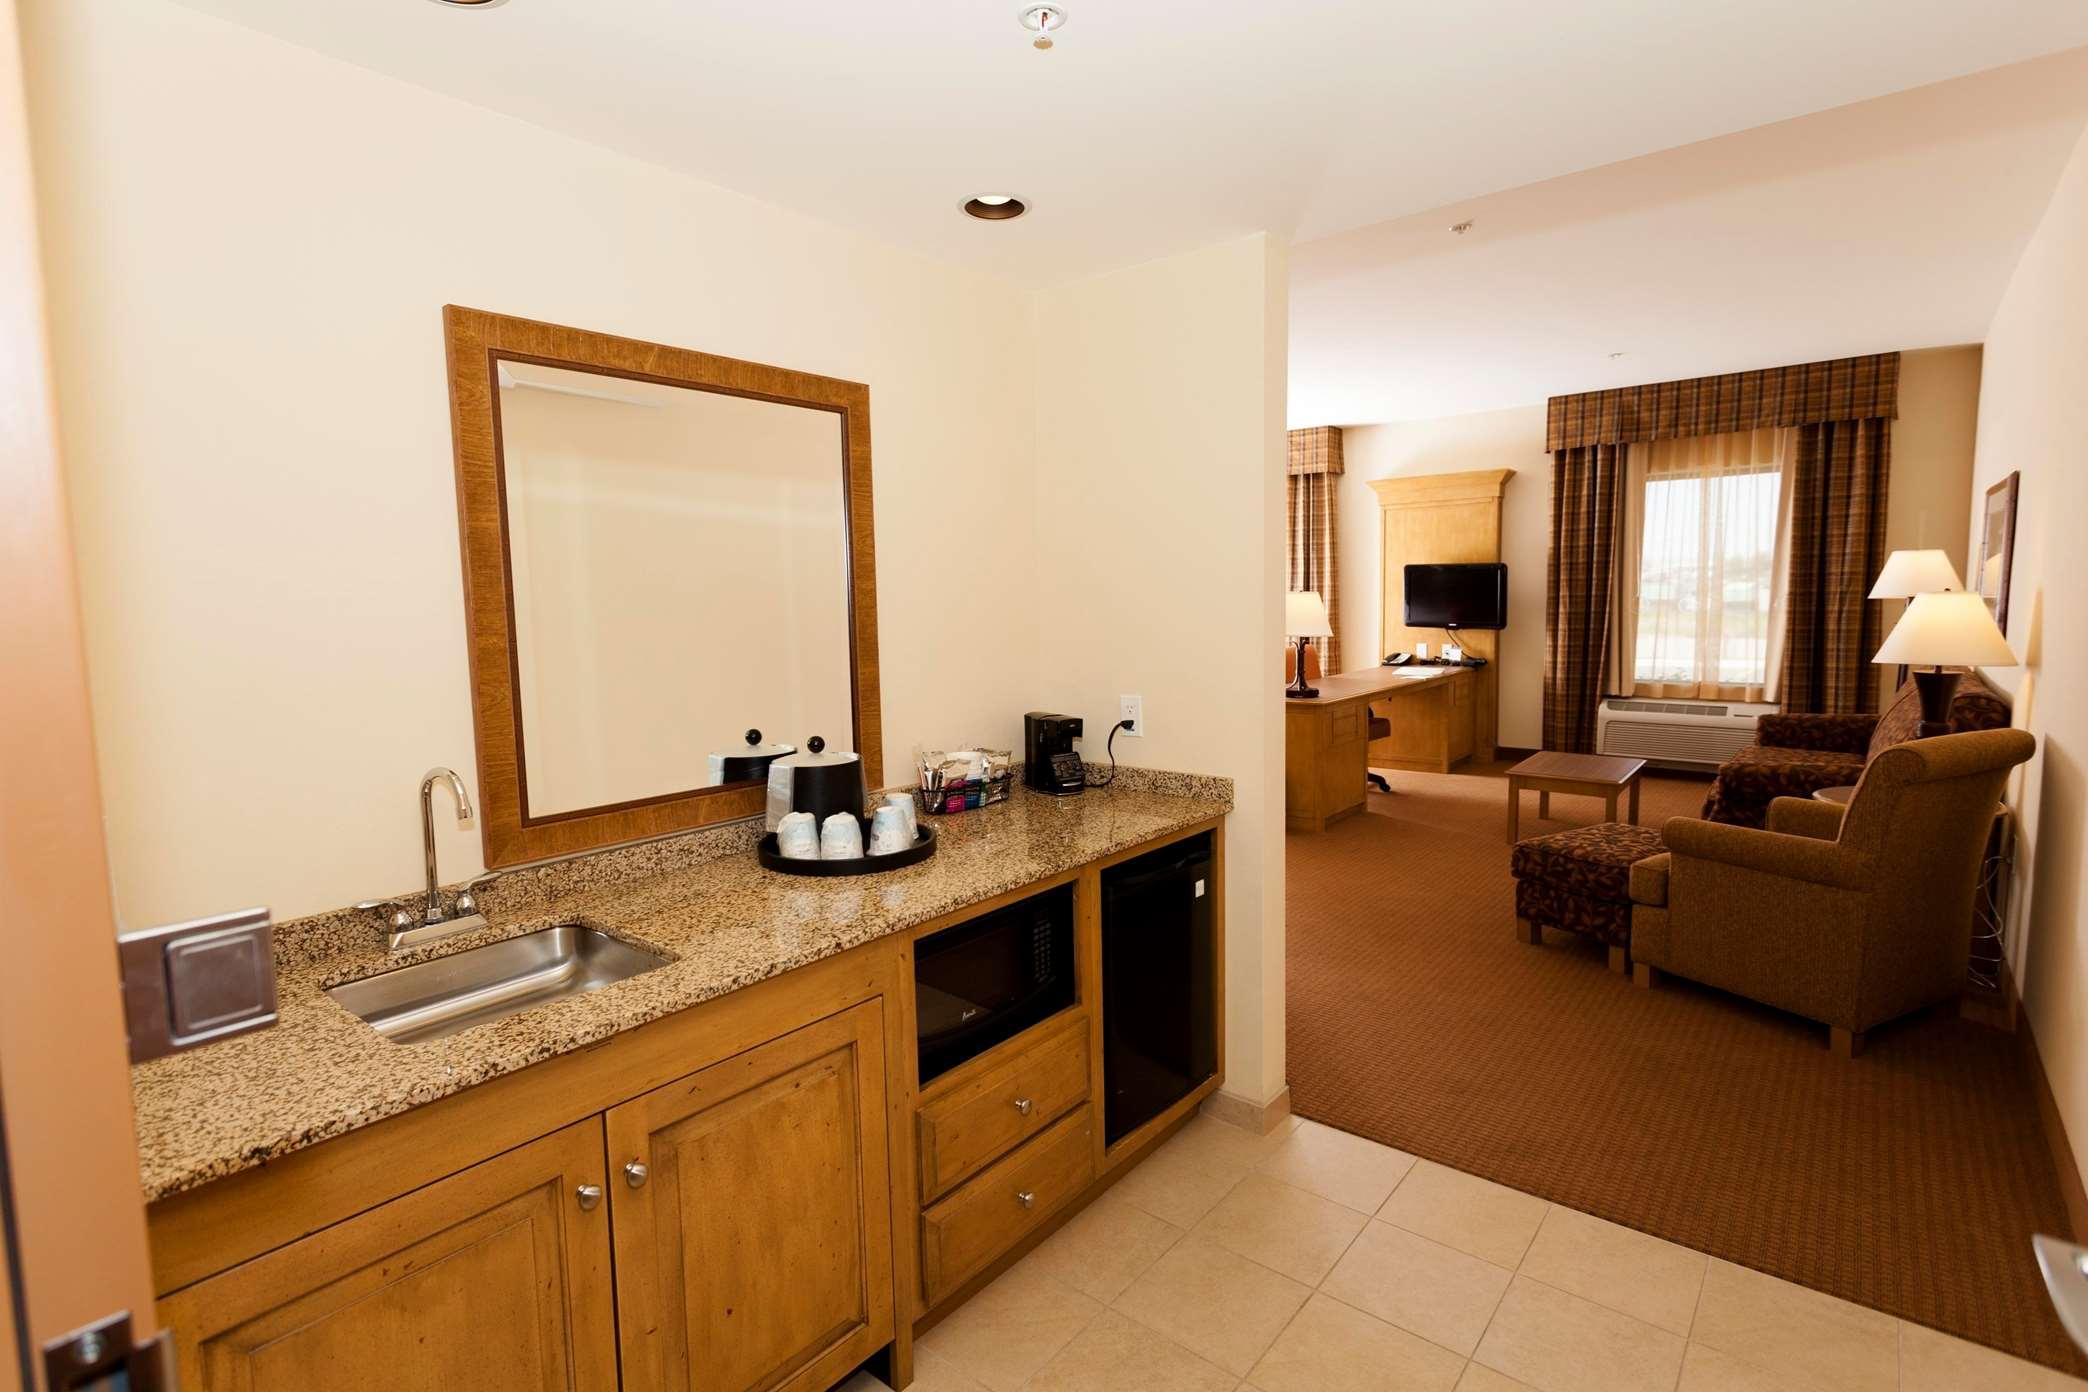 Hampton Inn & Suites Riverton image 19